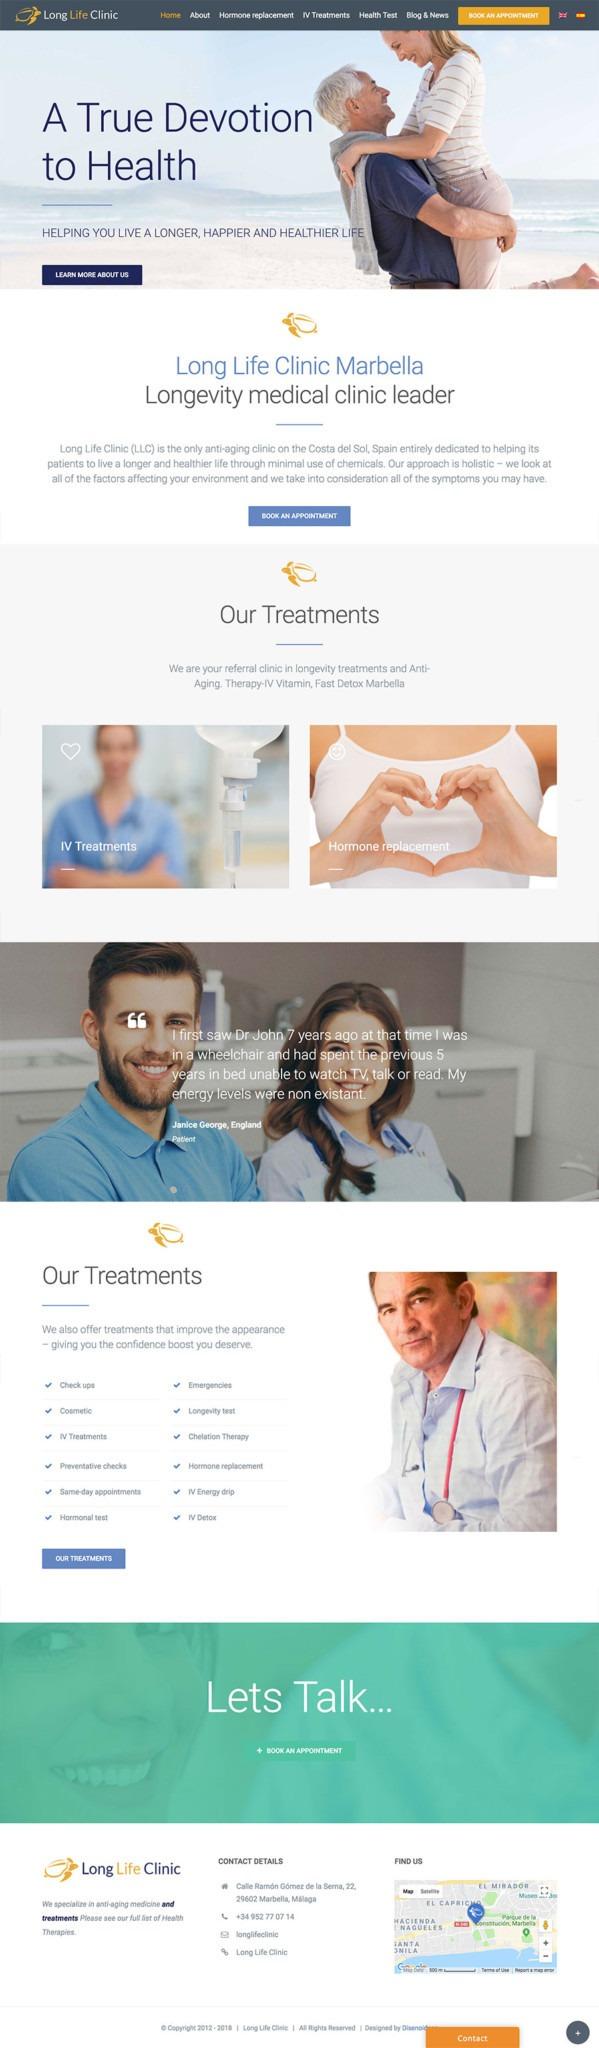 long-life-clinic-marbella-IV-Detox-clinic-website-design-wordpress-marbella